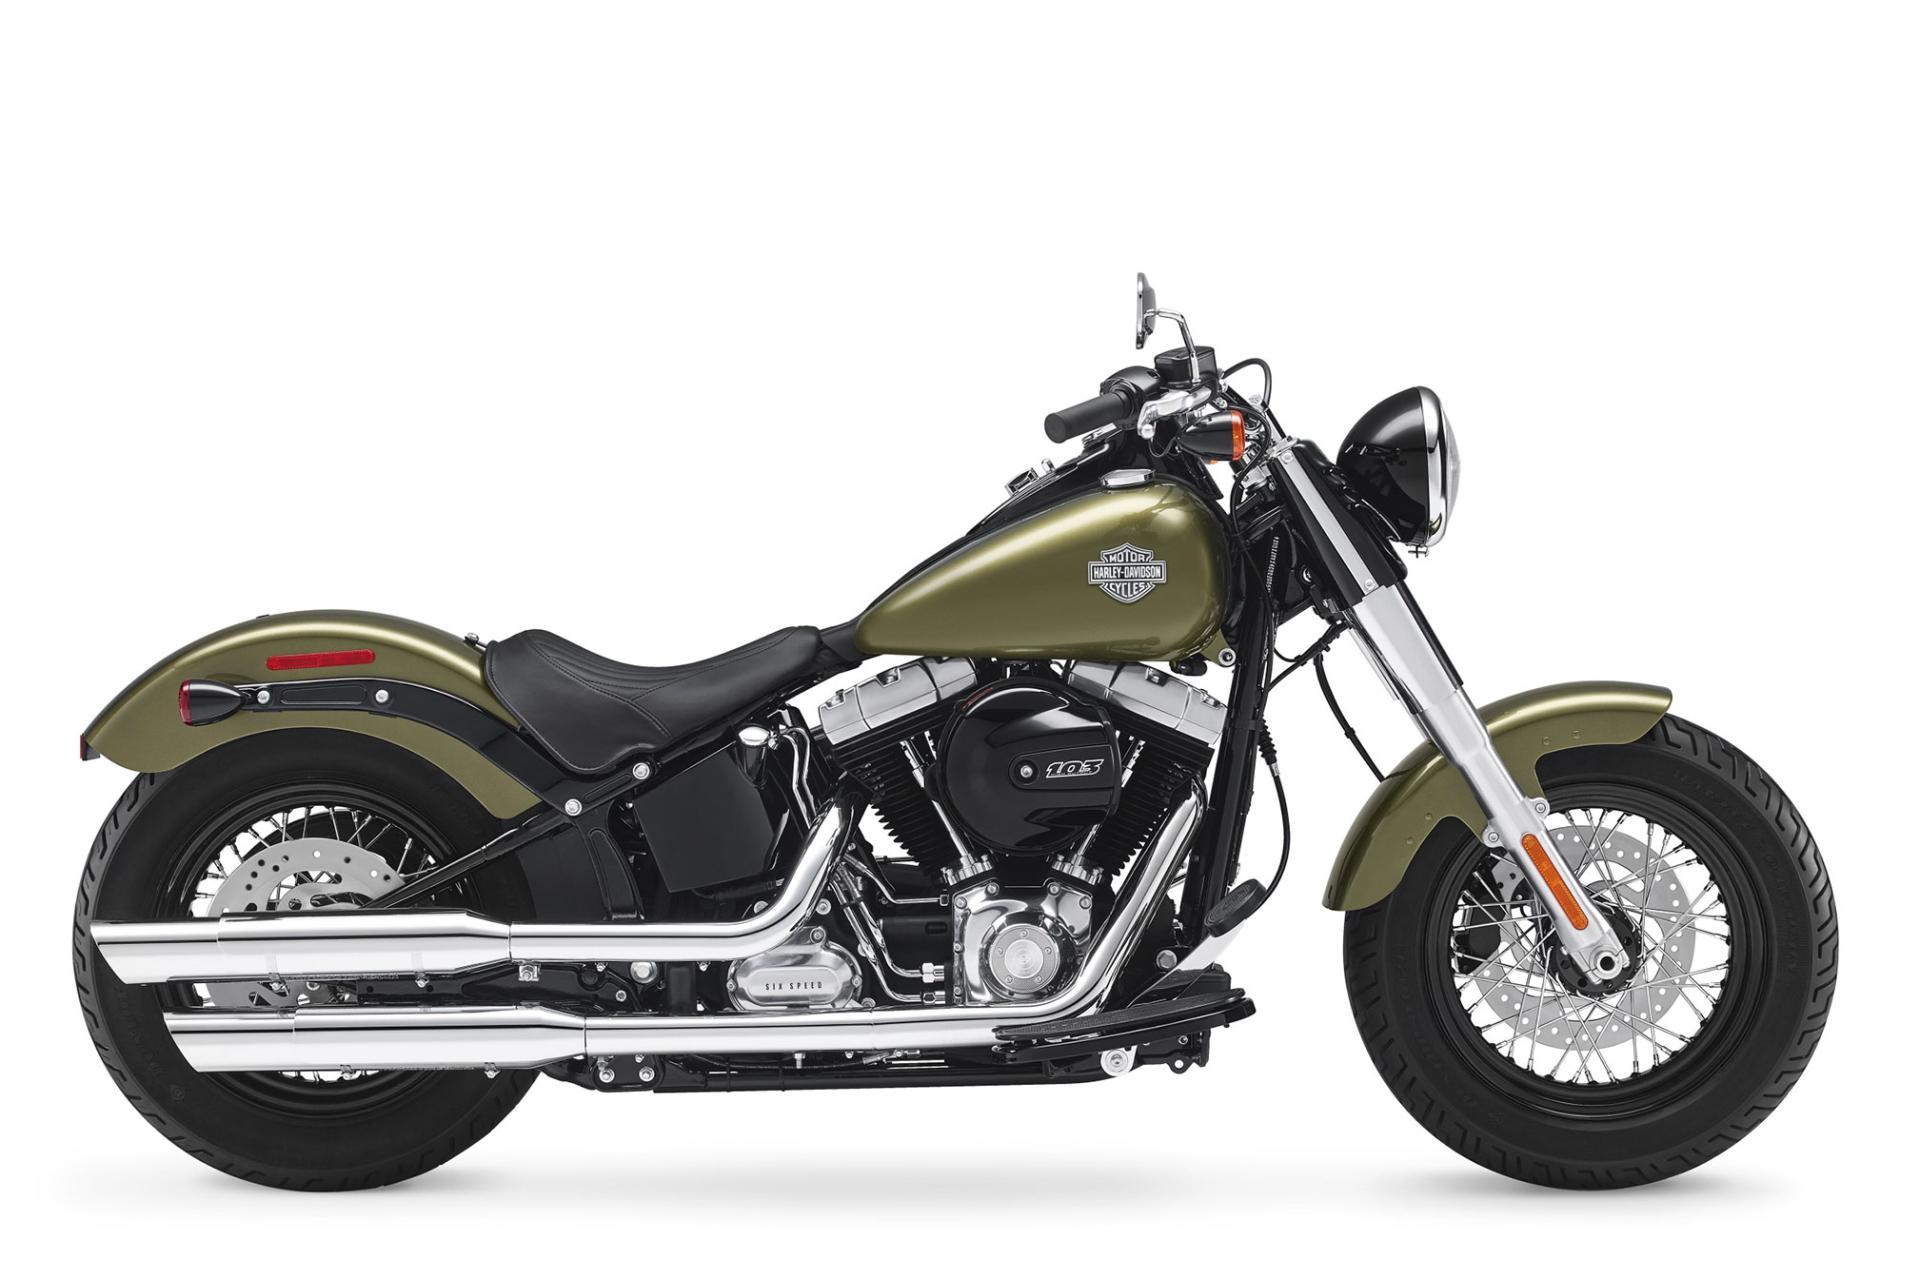 Harley-Davidson Softail Slim wallpapers HD quality